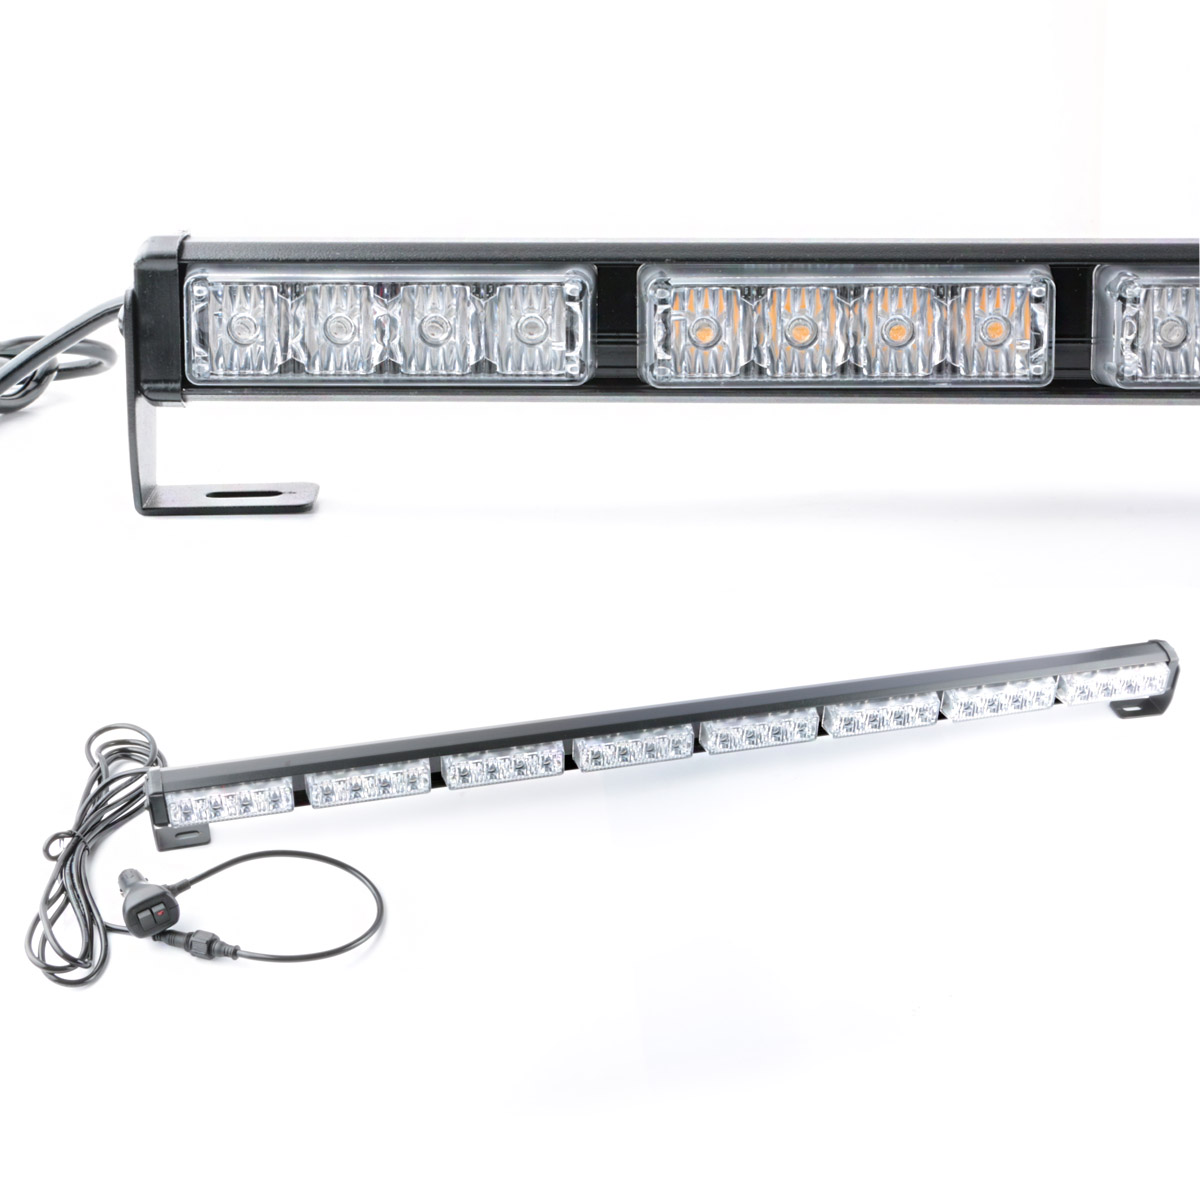 32 led car truck emergency warning traffic advisor strobe light bar. Black Bedroom Furniture Sets. Home Design Ideas